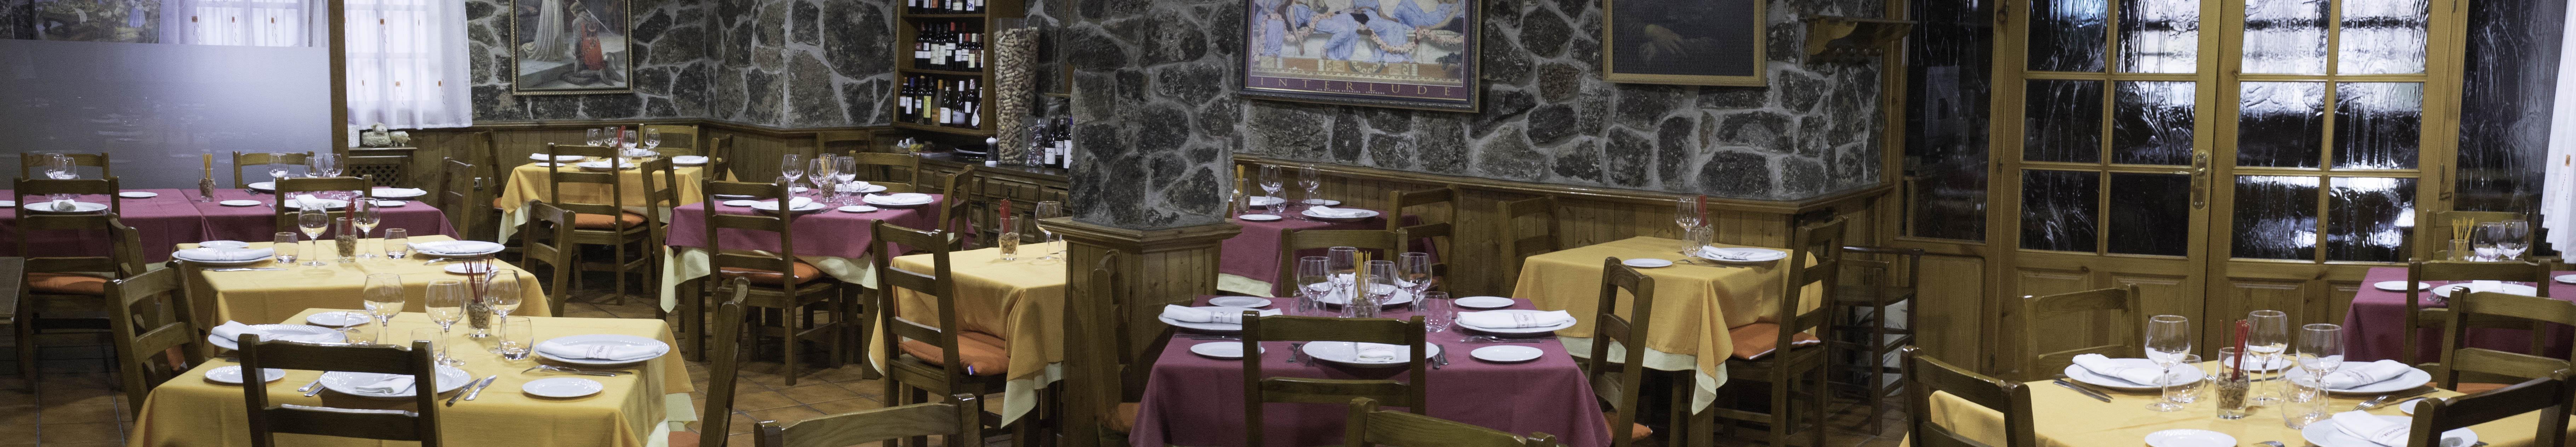 Restaurante-04_12_17_28-Pano-2